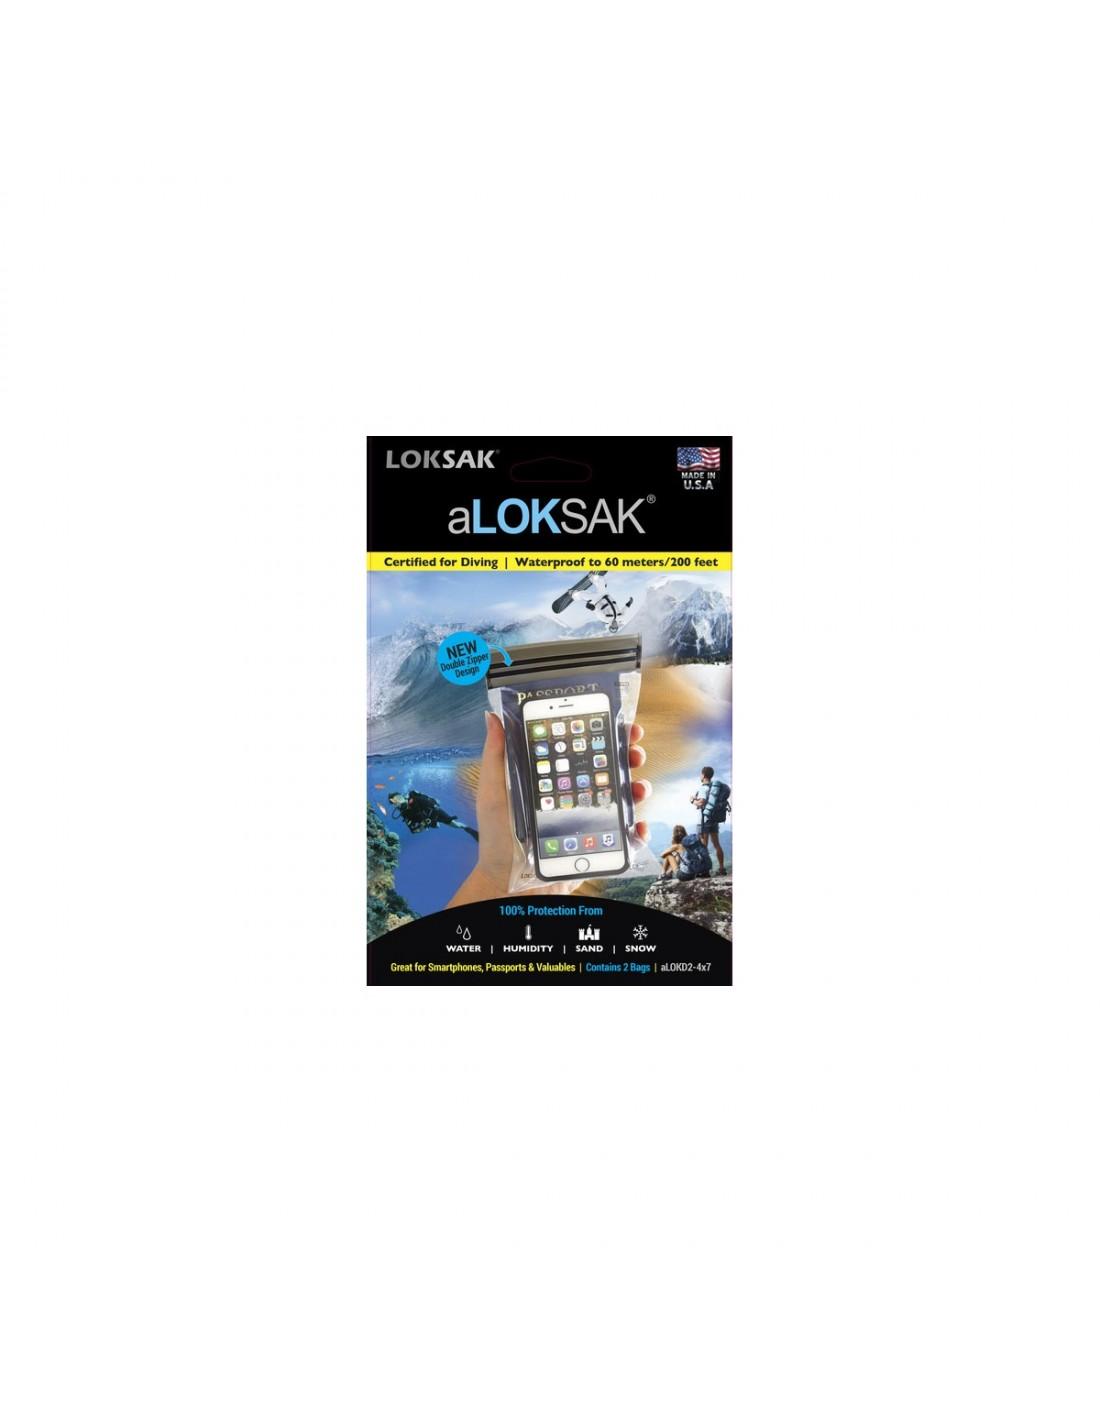 aLOKsak Vanntett Smarttelefon Pose 11,2x18,4cm 2stk